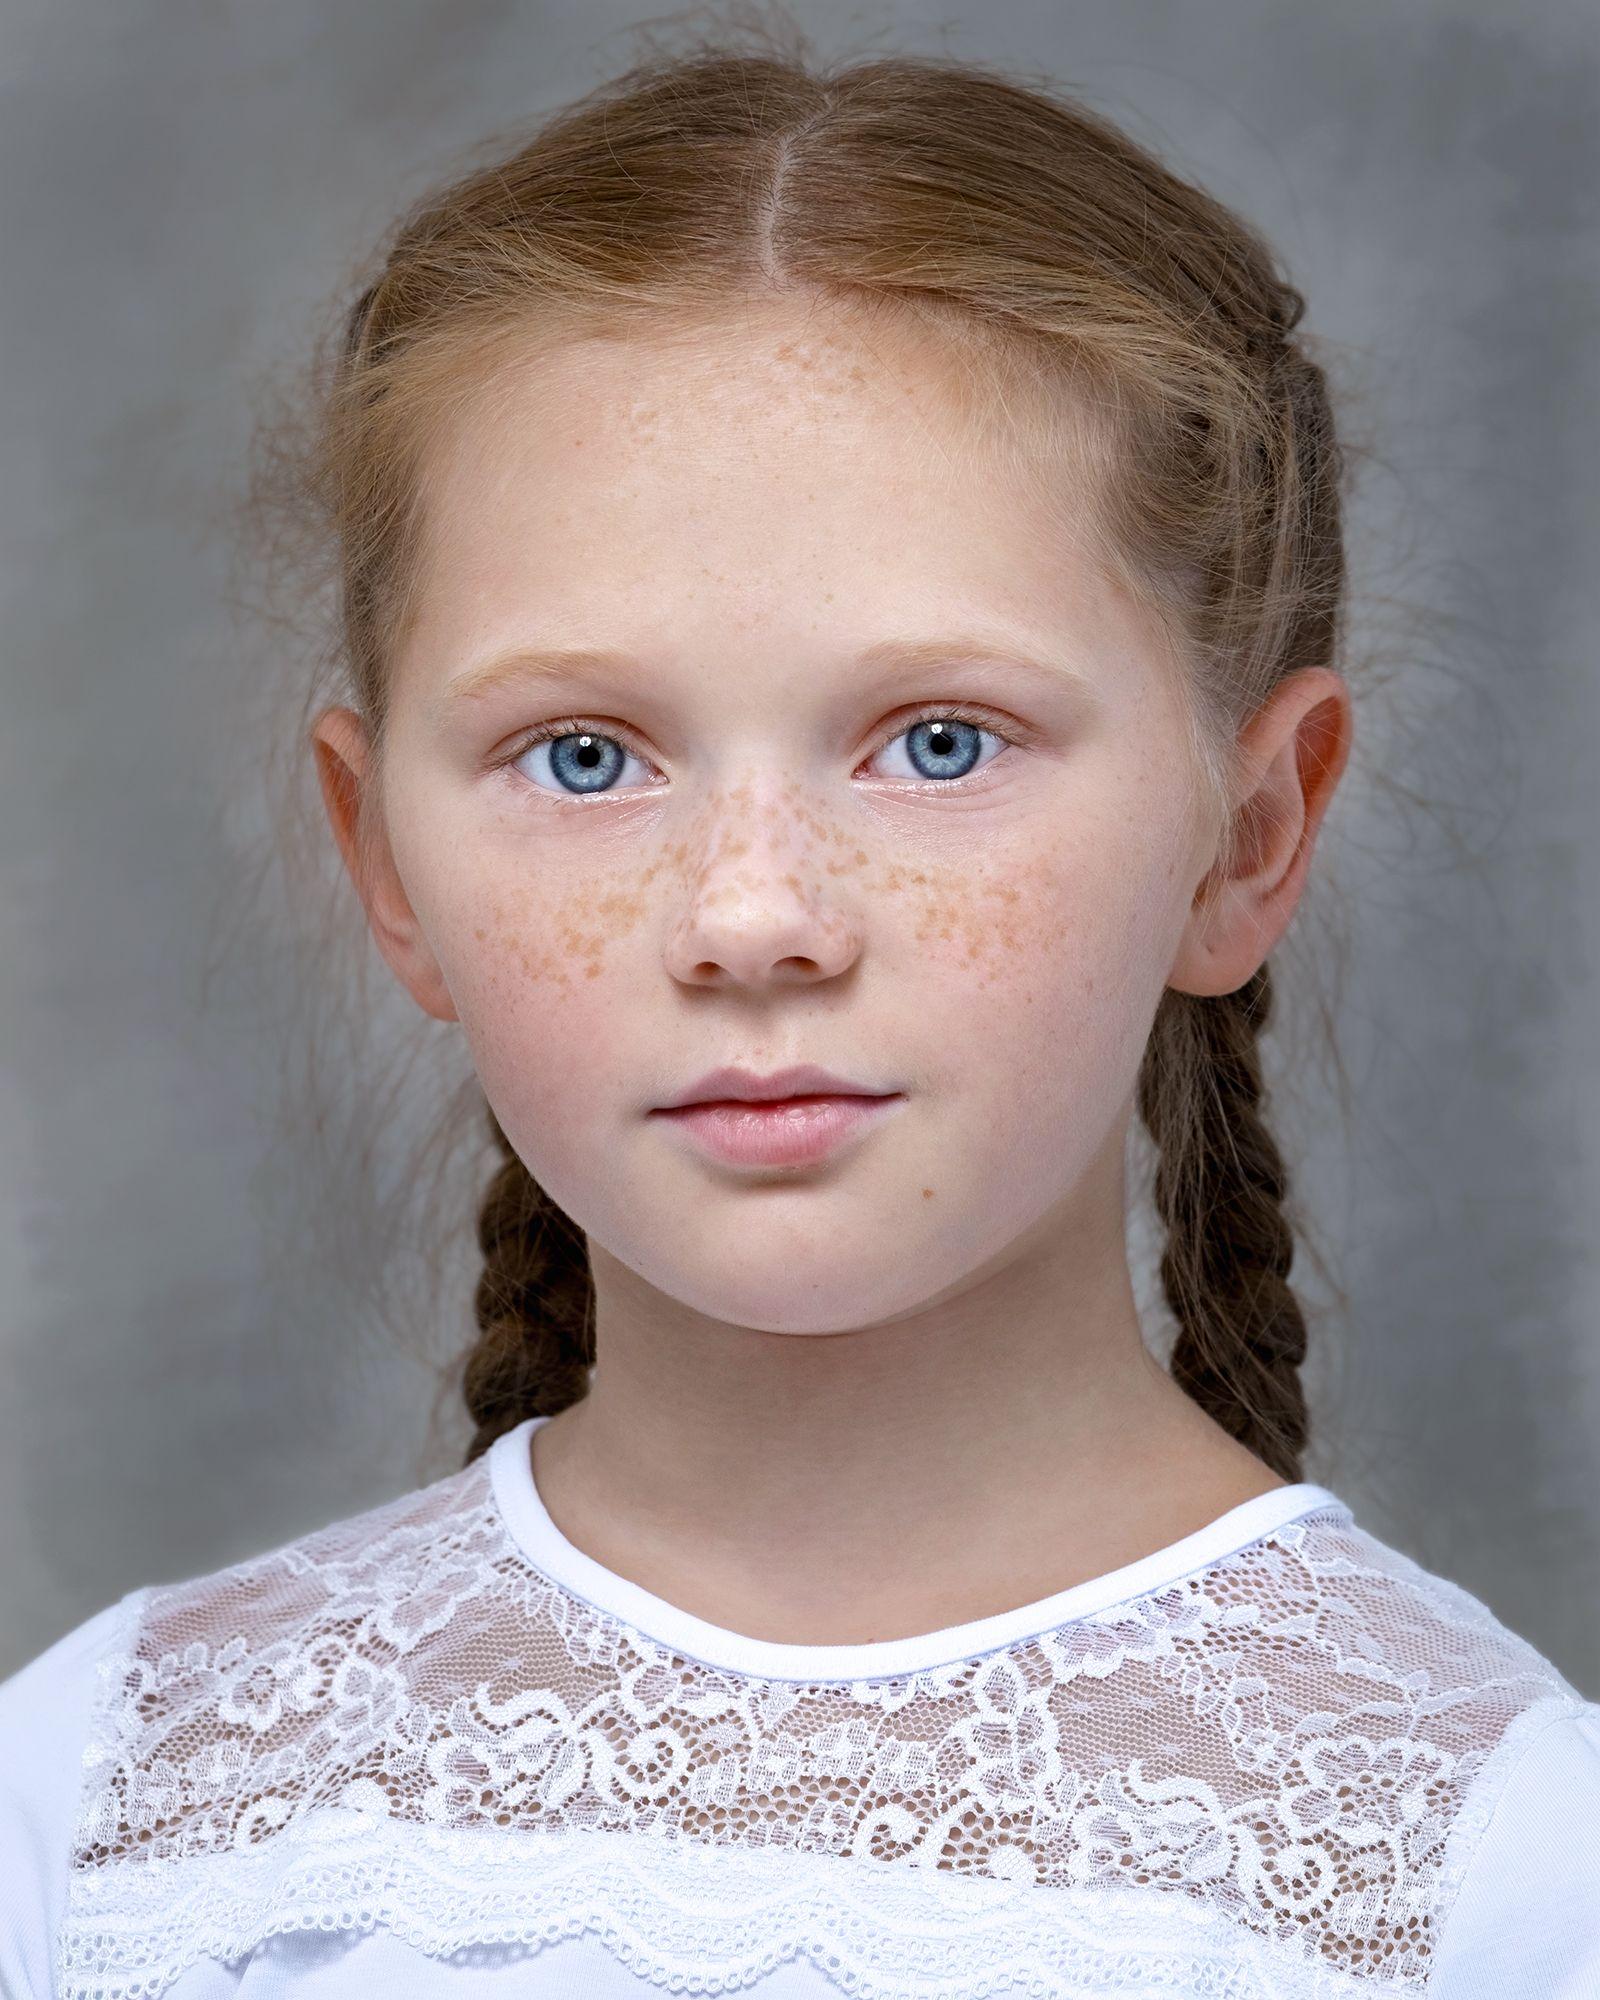 children\'s portrait, redhead girl, portrait of a child, funny, aleksandrshvedov, 2portraits, Shvedov Aleksandr